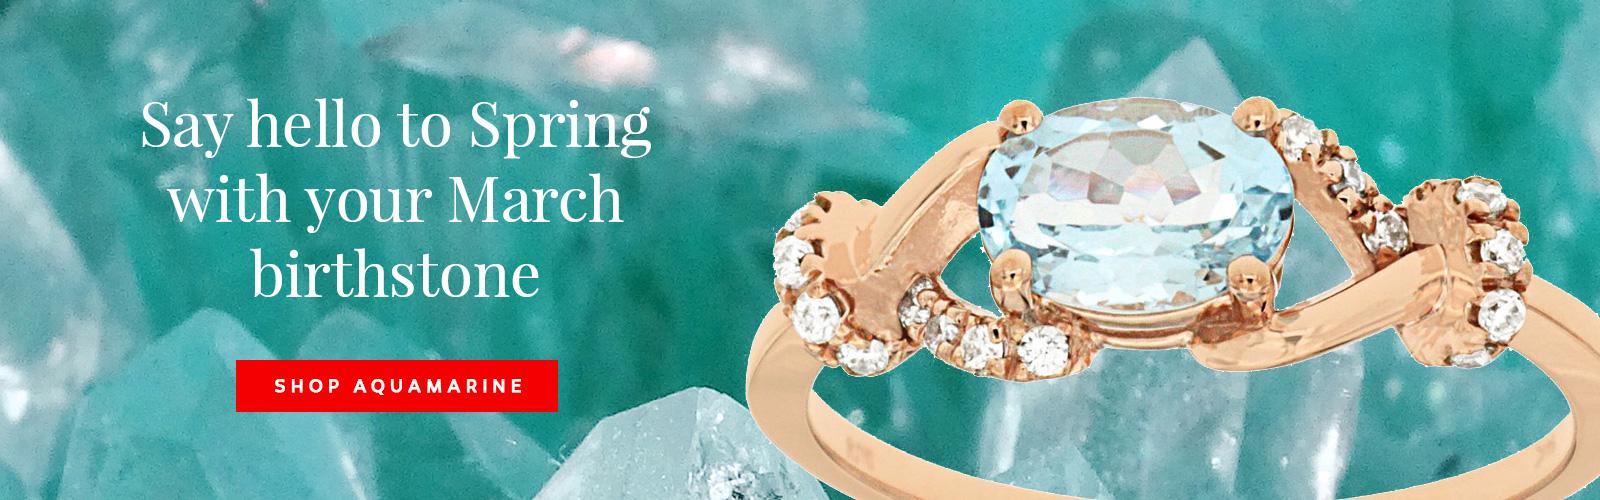 March Birthstone - Joes Jewelery